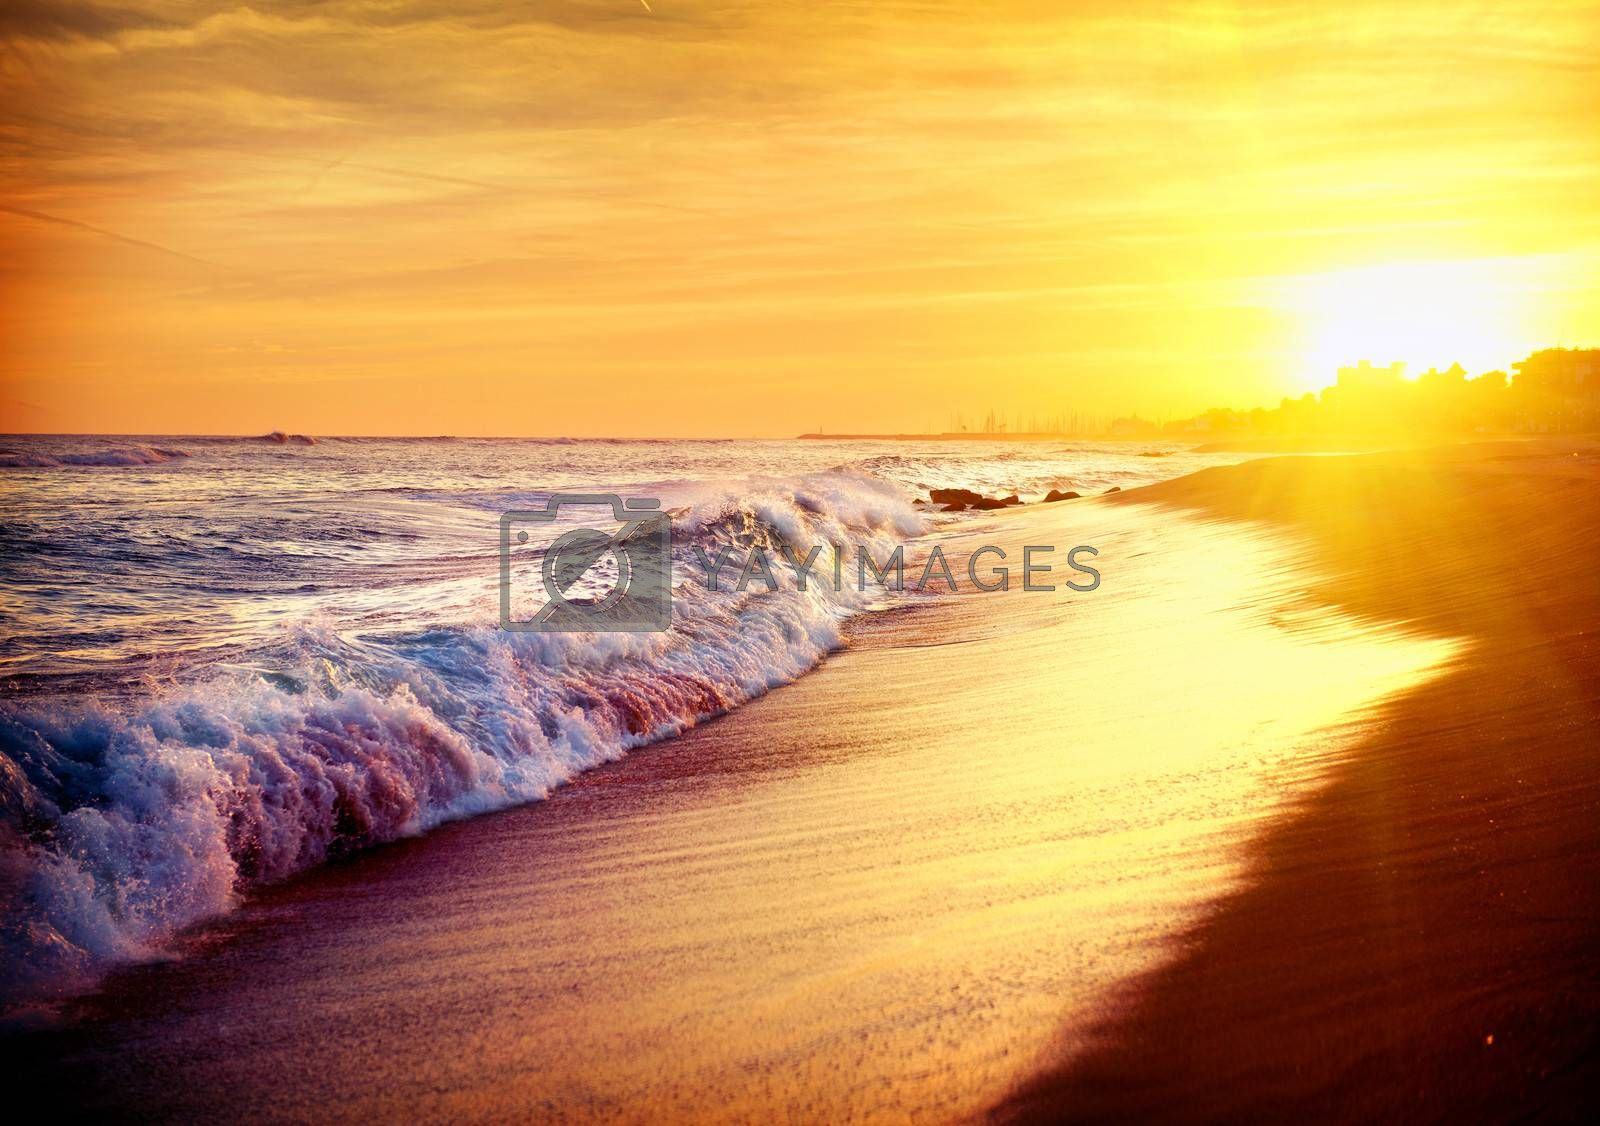 Beautiful Sea Sunset Beach. Mediterranean Sea. Spain by SubbotinaA